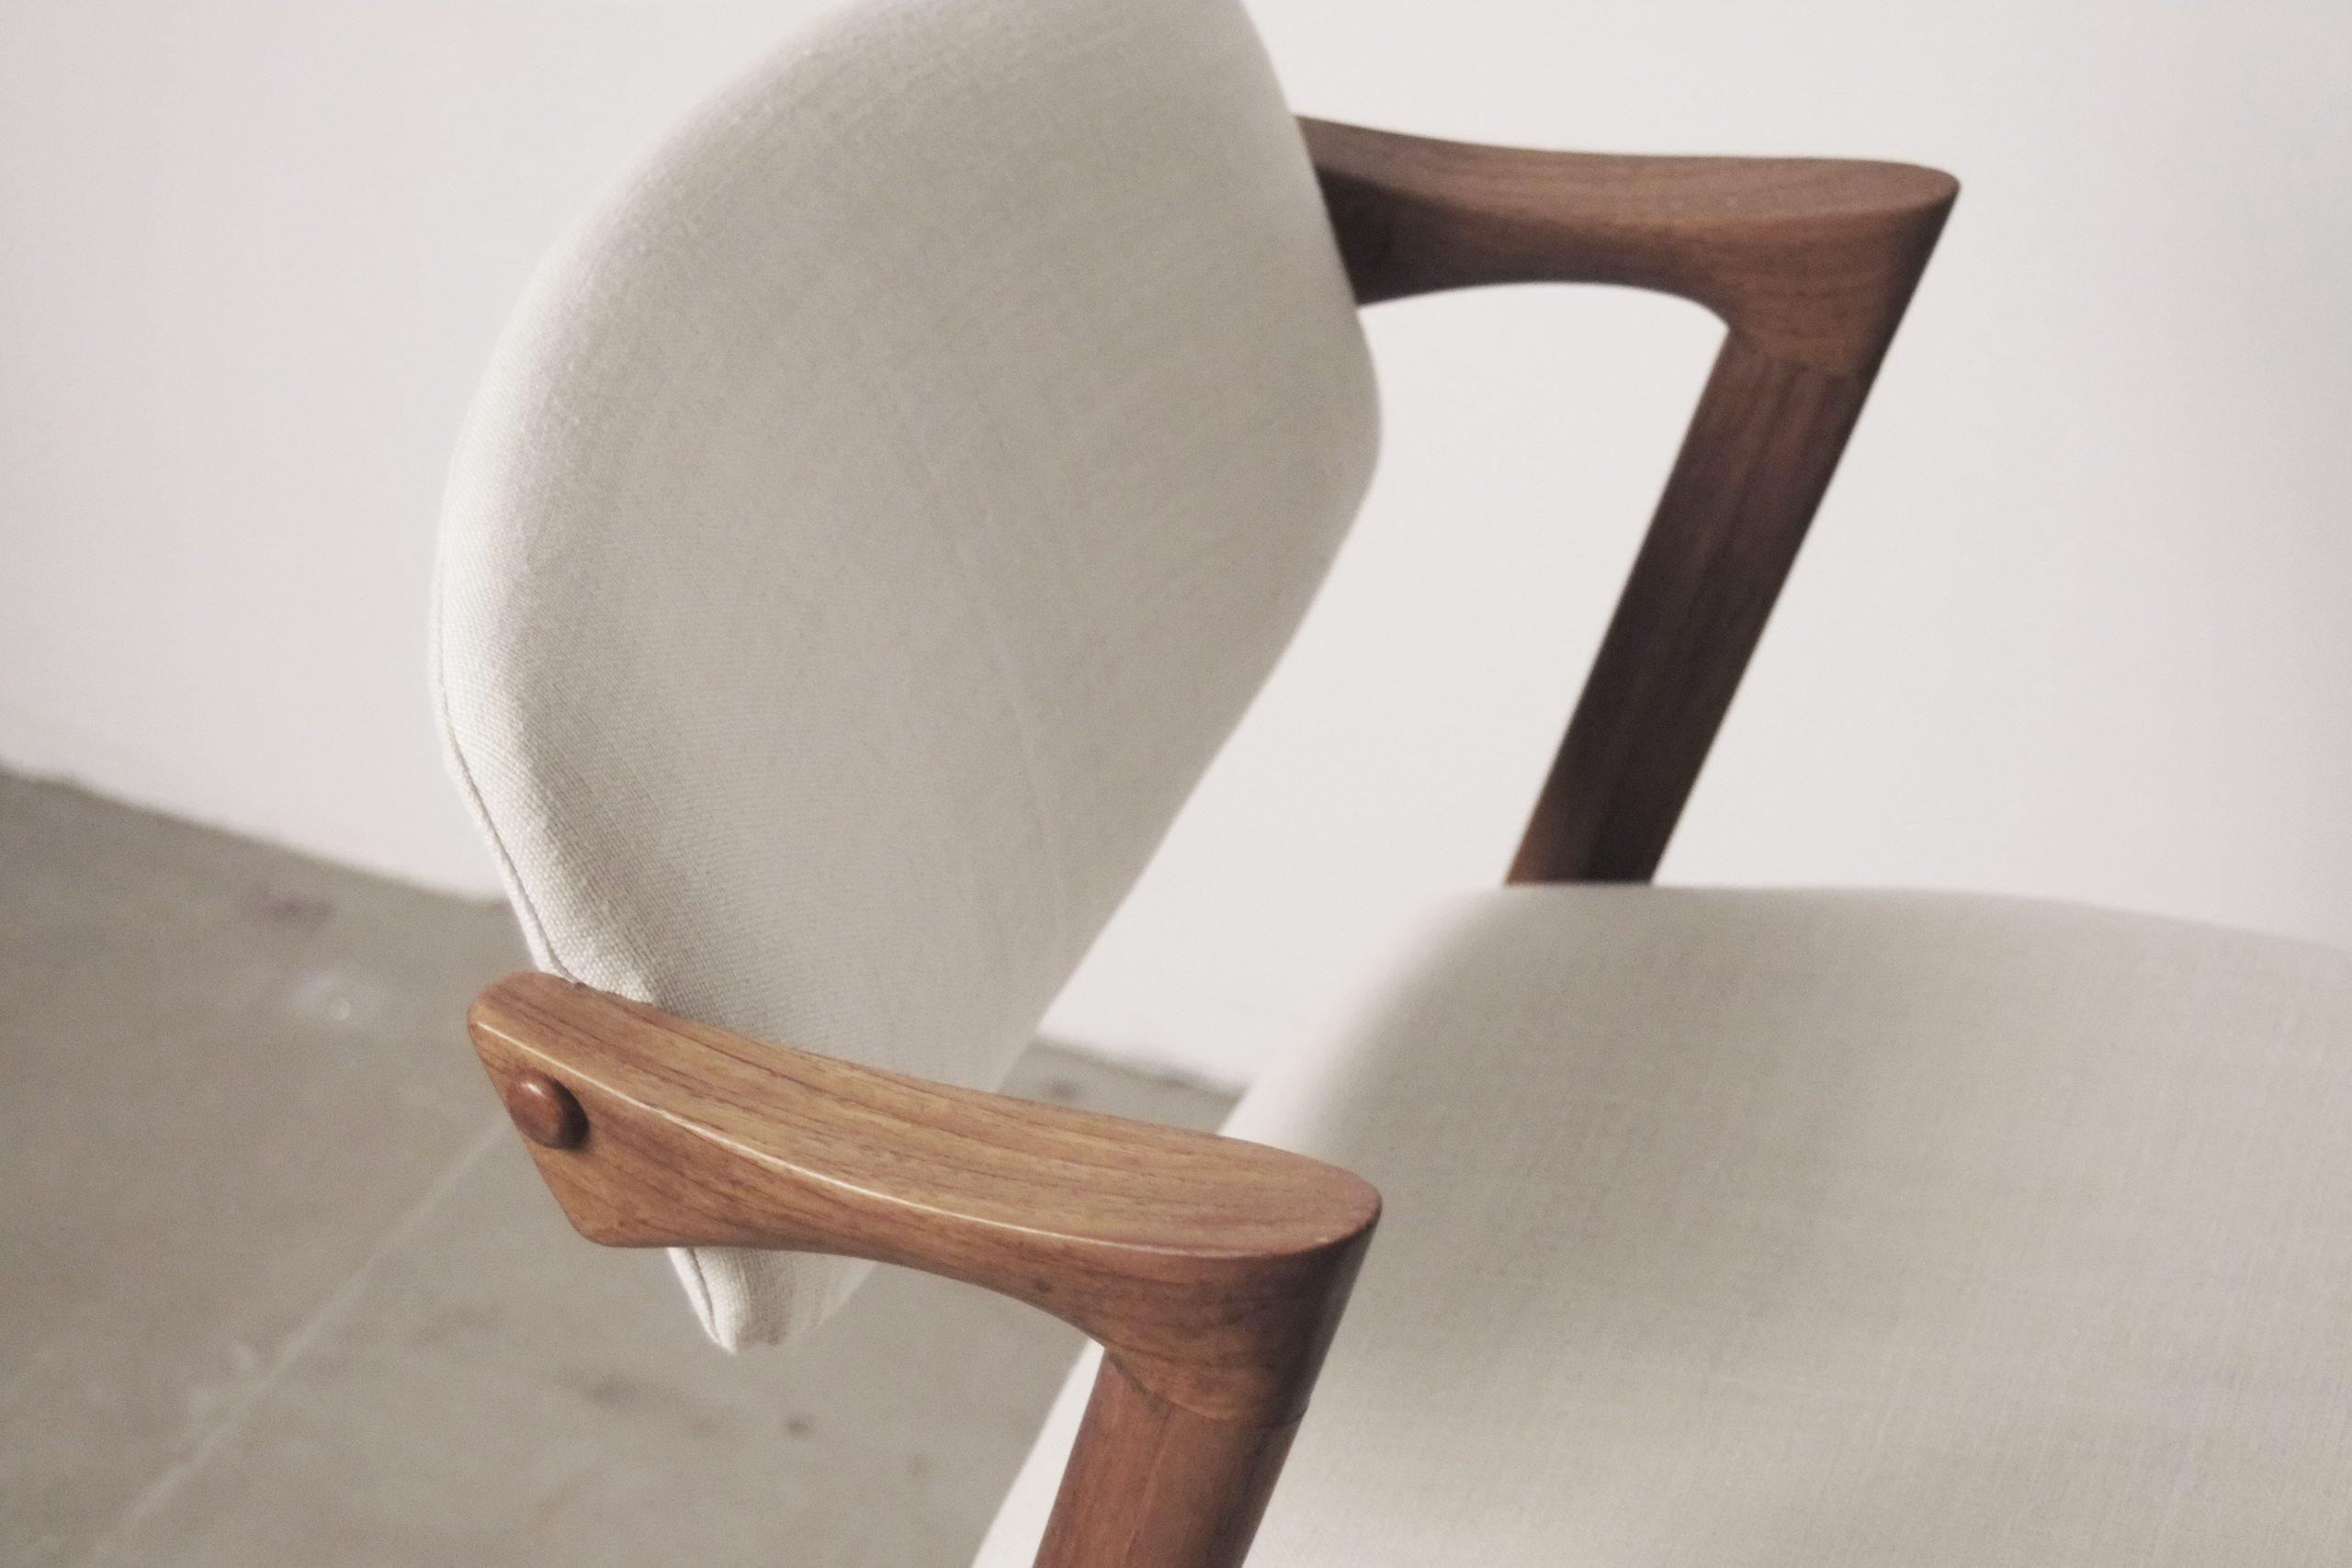 detalle reposa brazos reposabrazos de madera maciza de teca natural diseño silla de autor de diseño